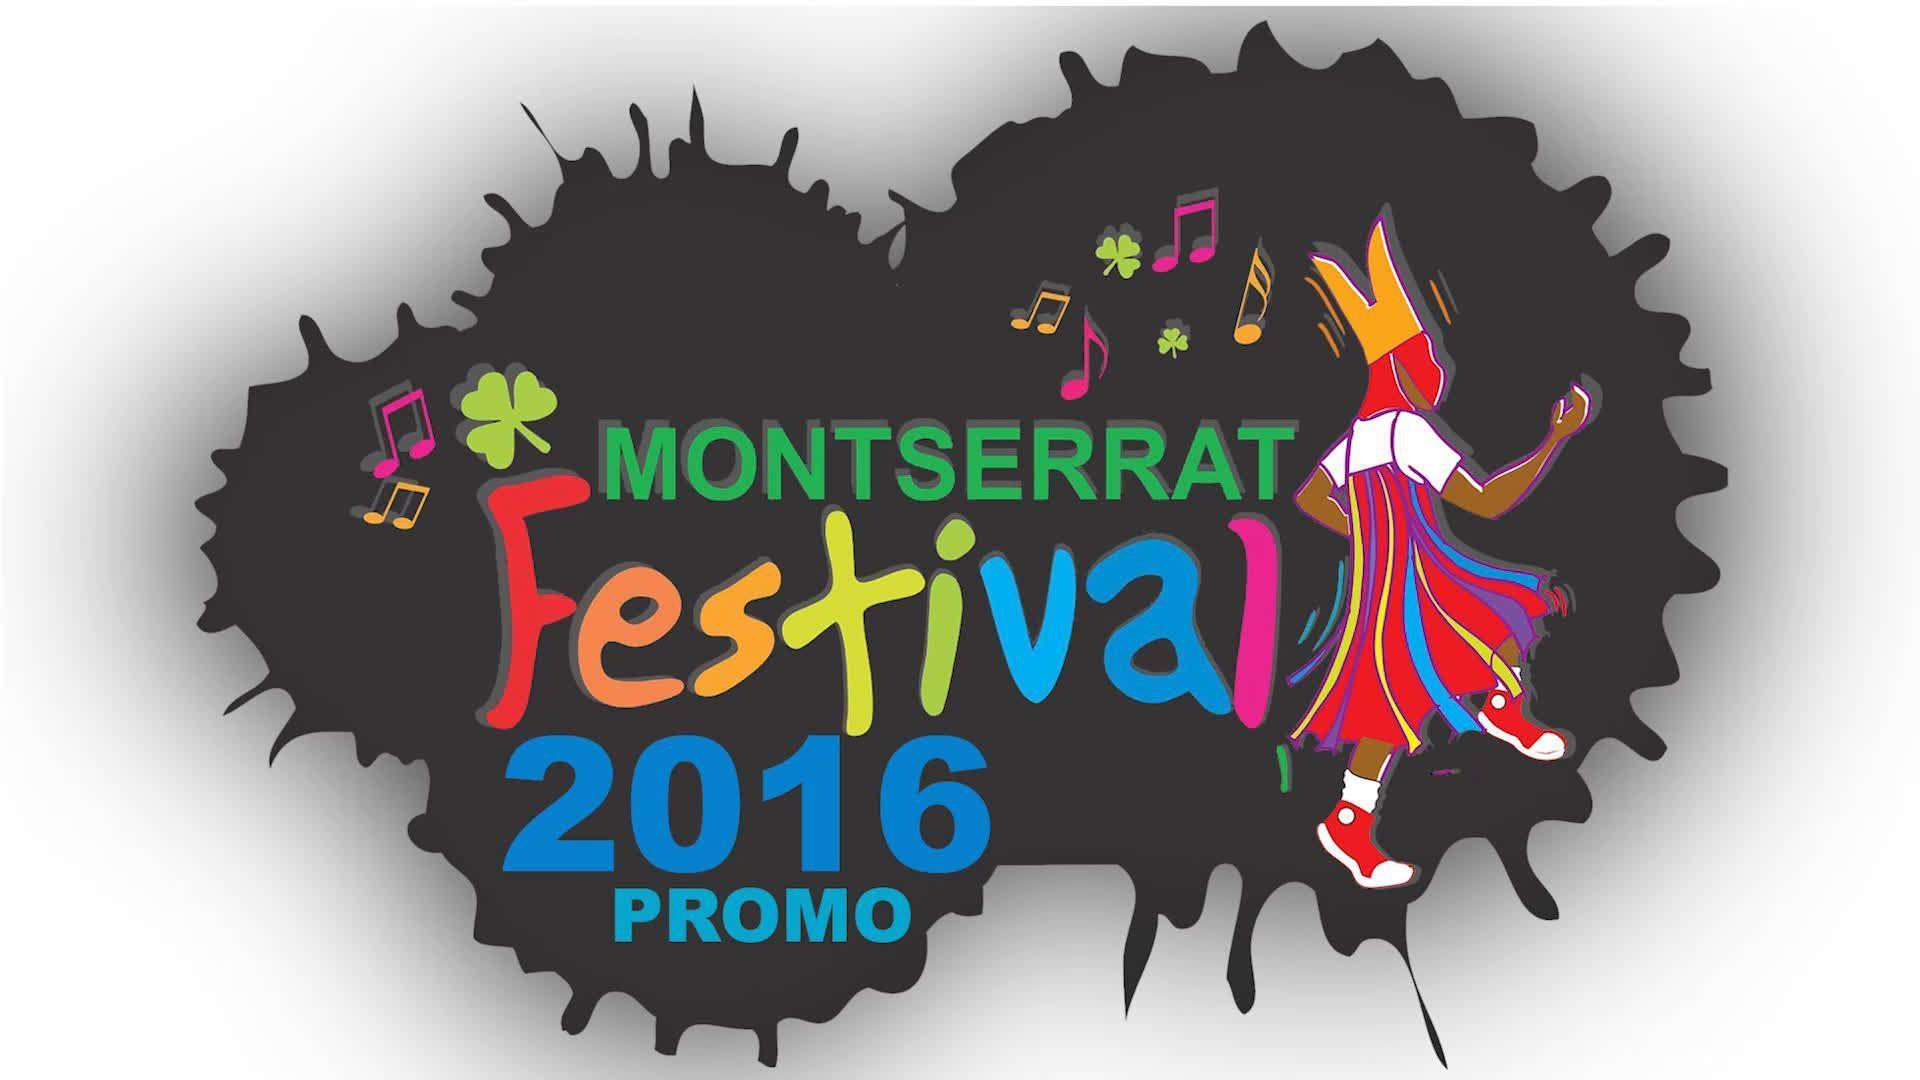 Montserrat Opening of Festival / Calypso Semifinals 2016